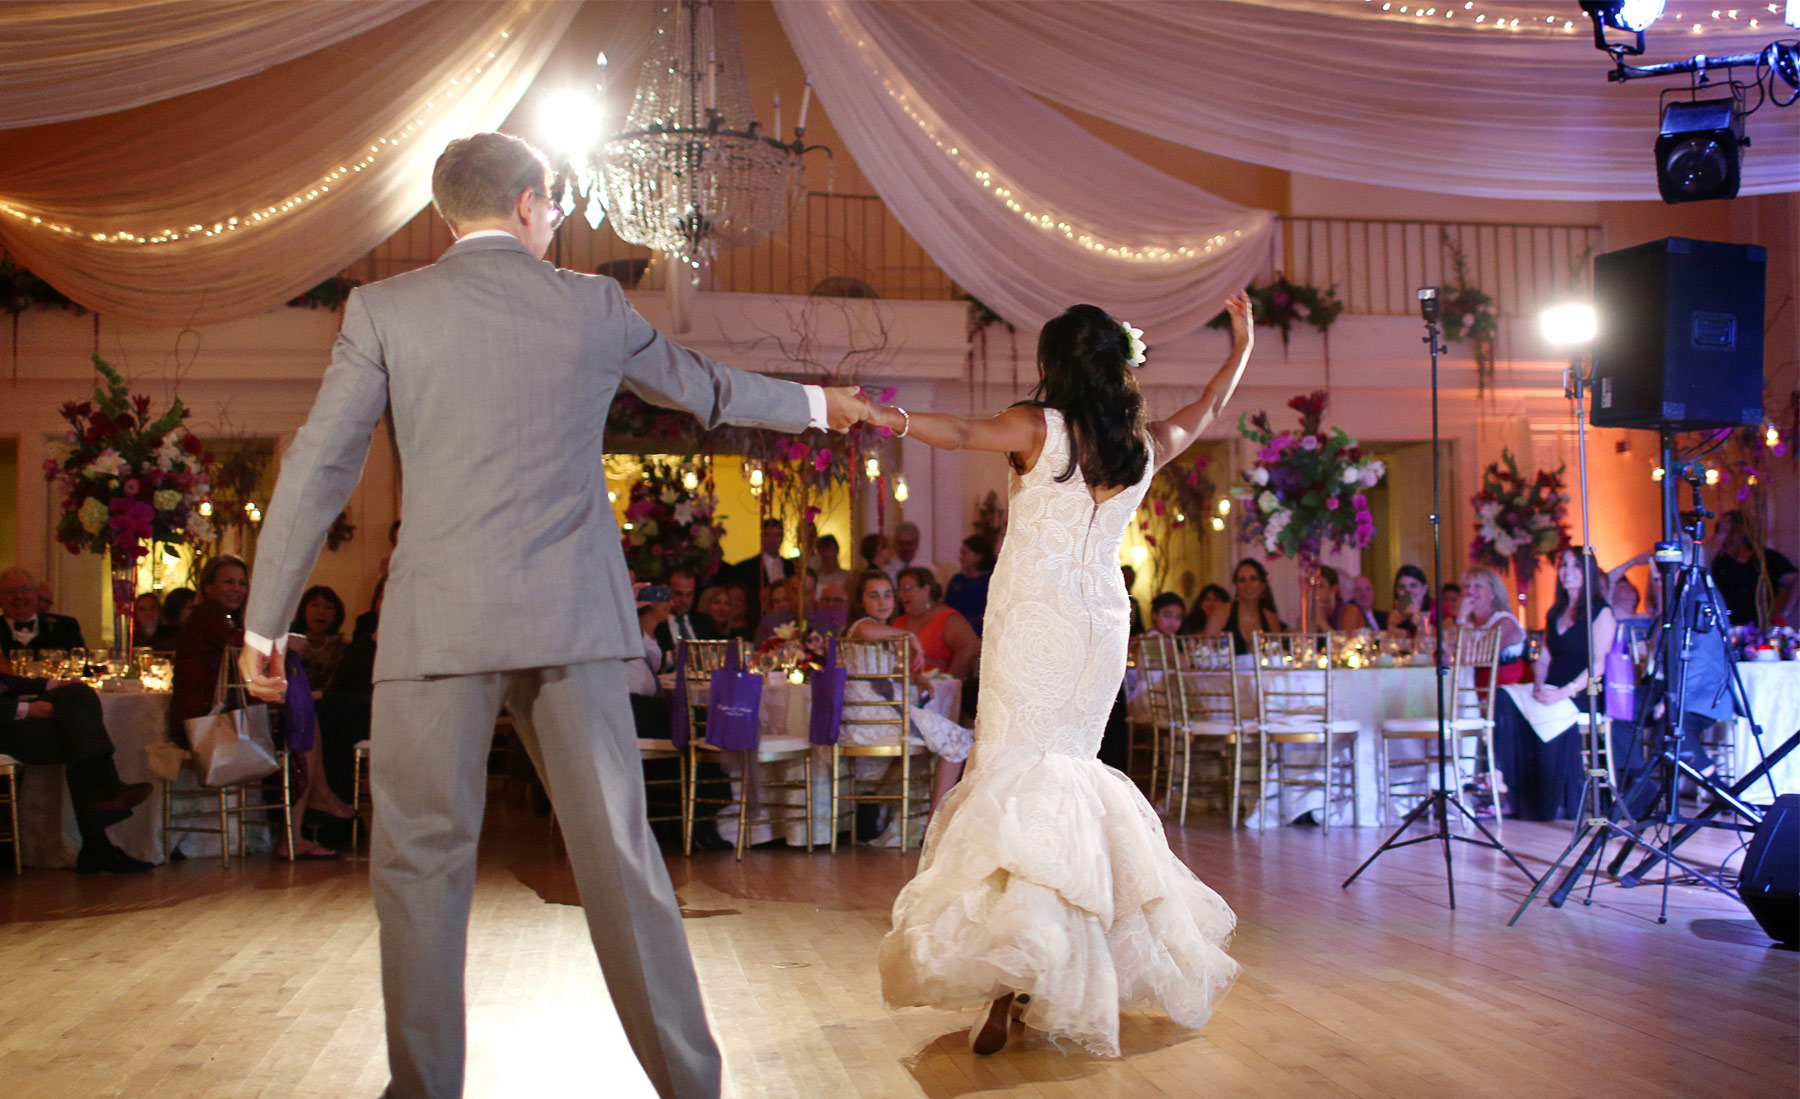 16-Minneapolis-Minnesota-Wedding-Photography-by-Vick-Photography-Lafayette-Country-Club-Reception-First-Dance-Daphne-&-Austin.jpg